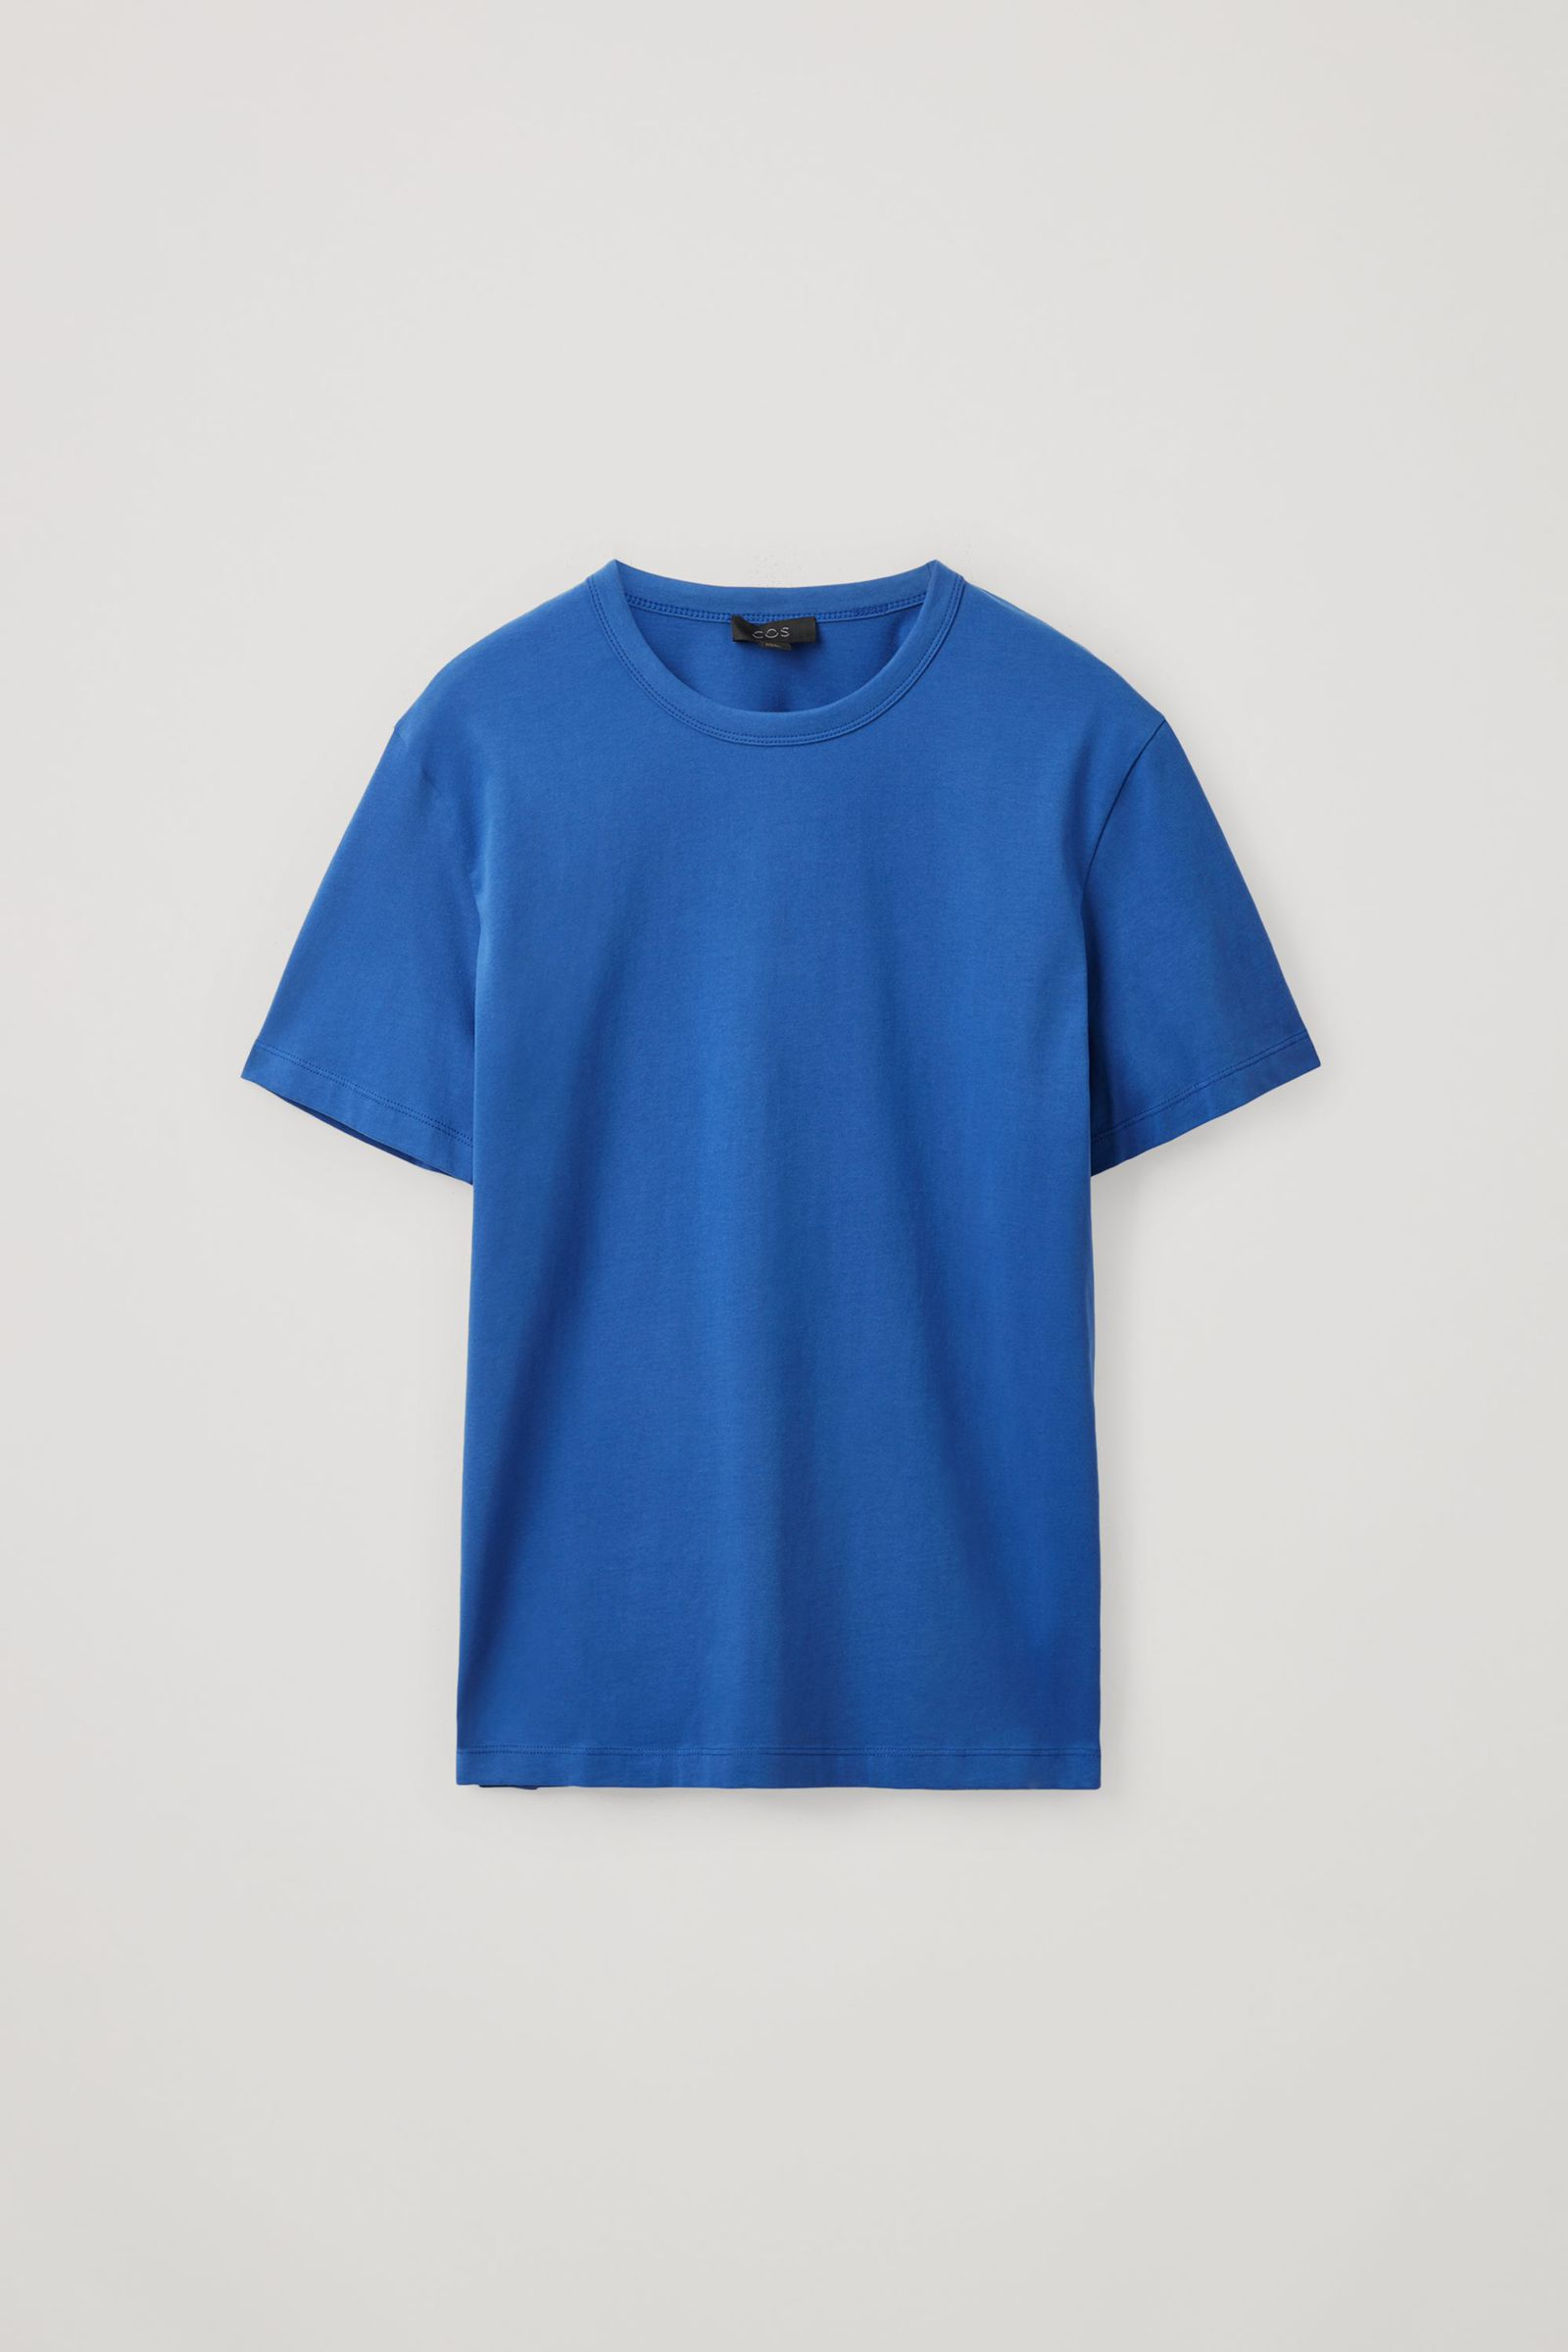 COS 브러쉬드 코튼 티셔츠의 블루컬러 Product입니다.